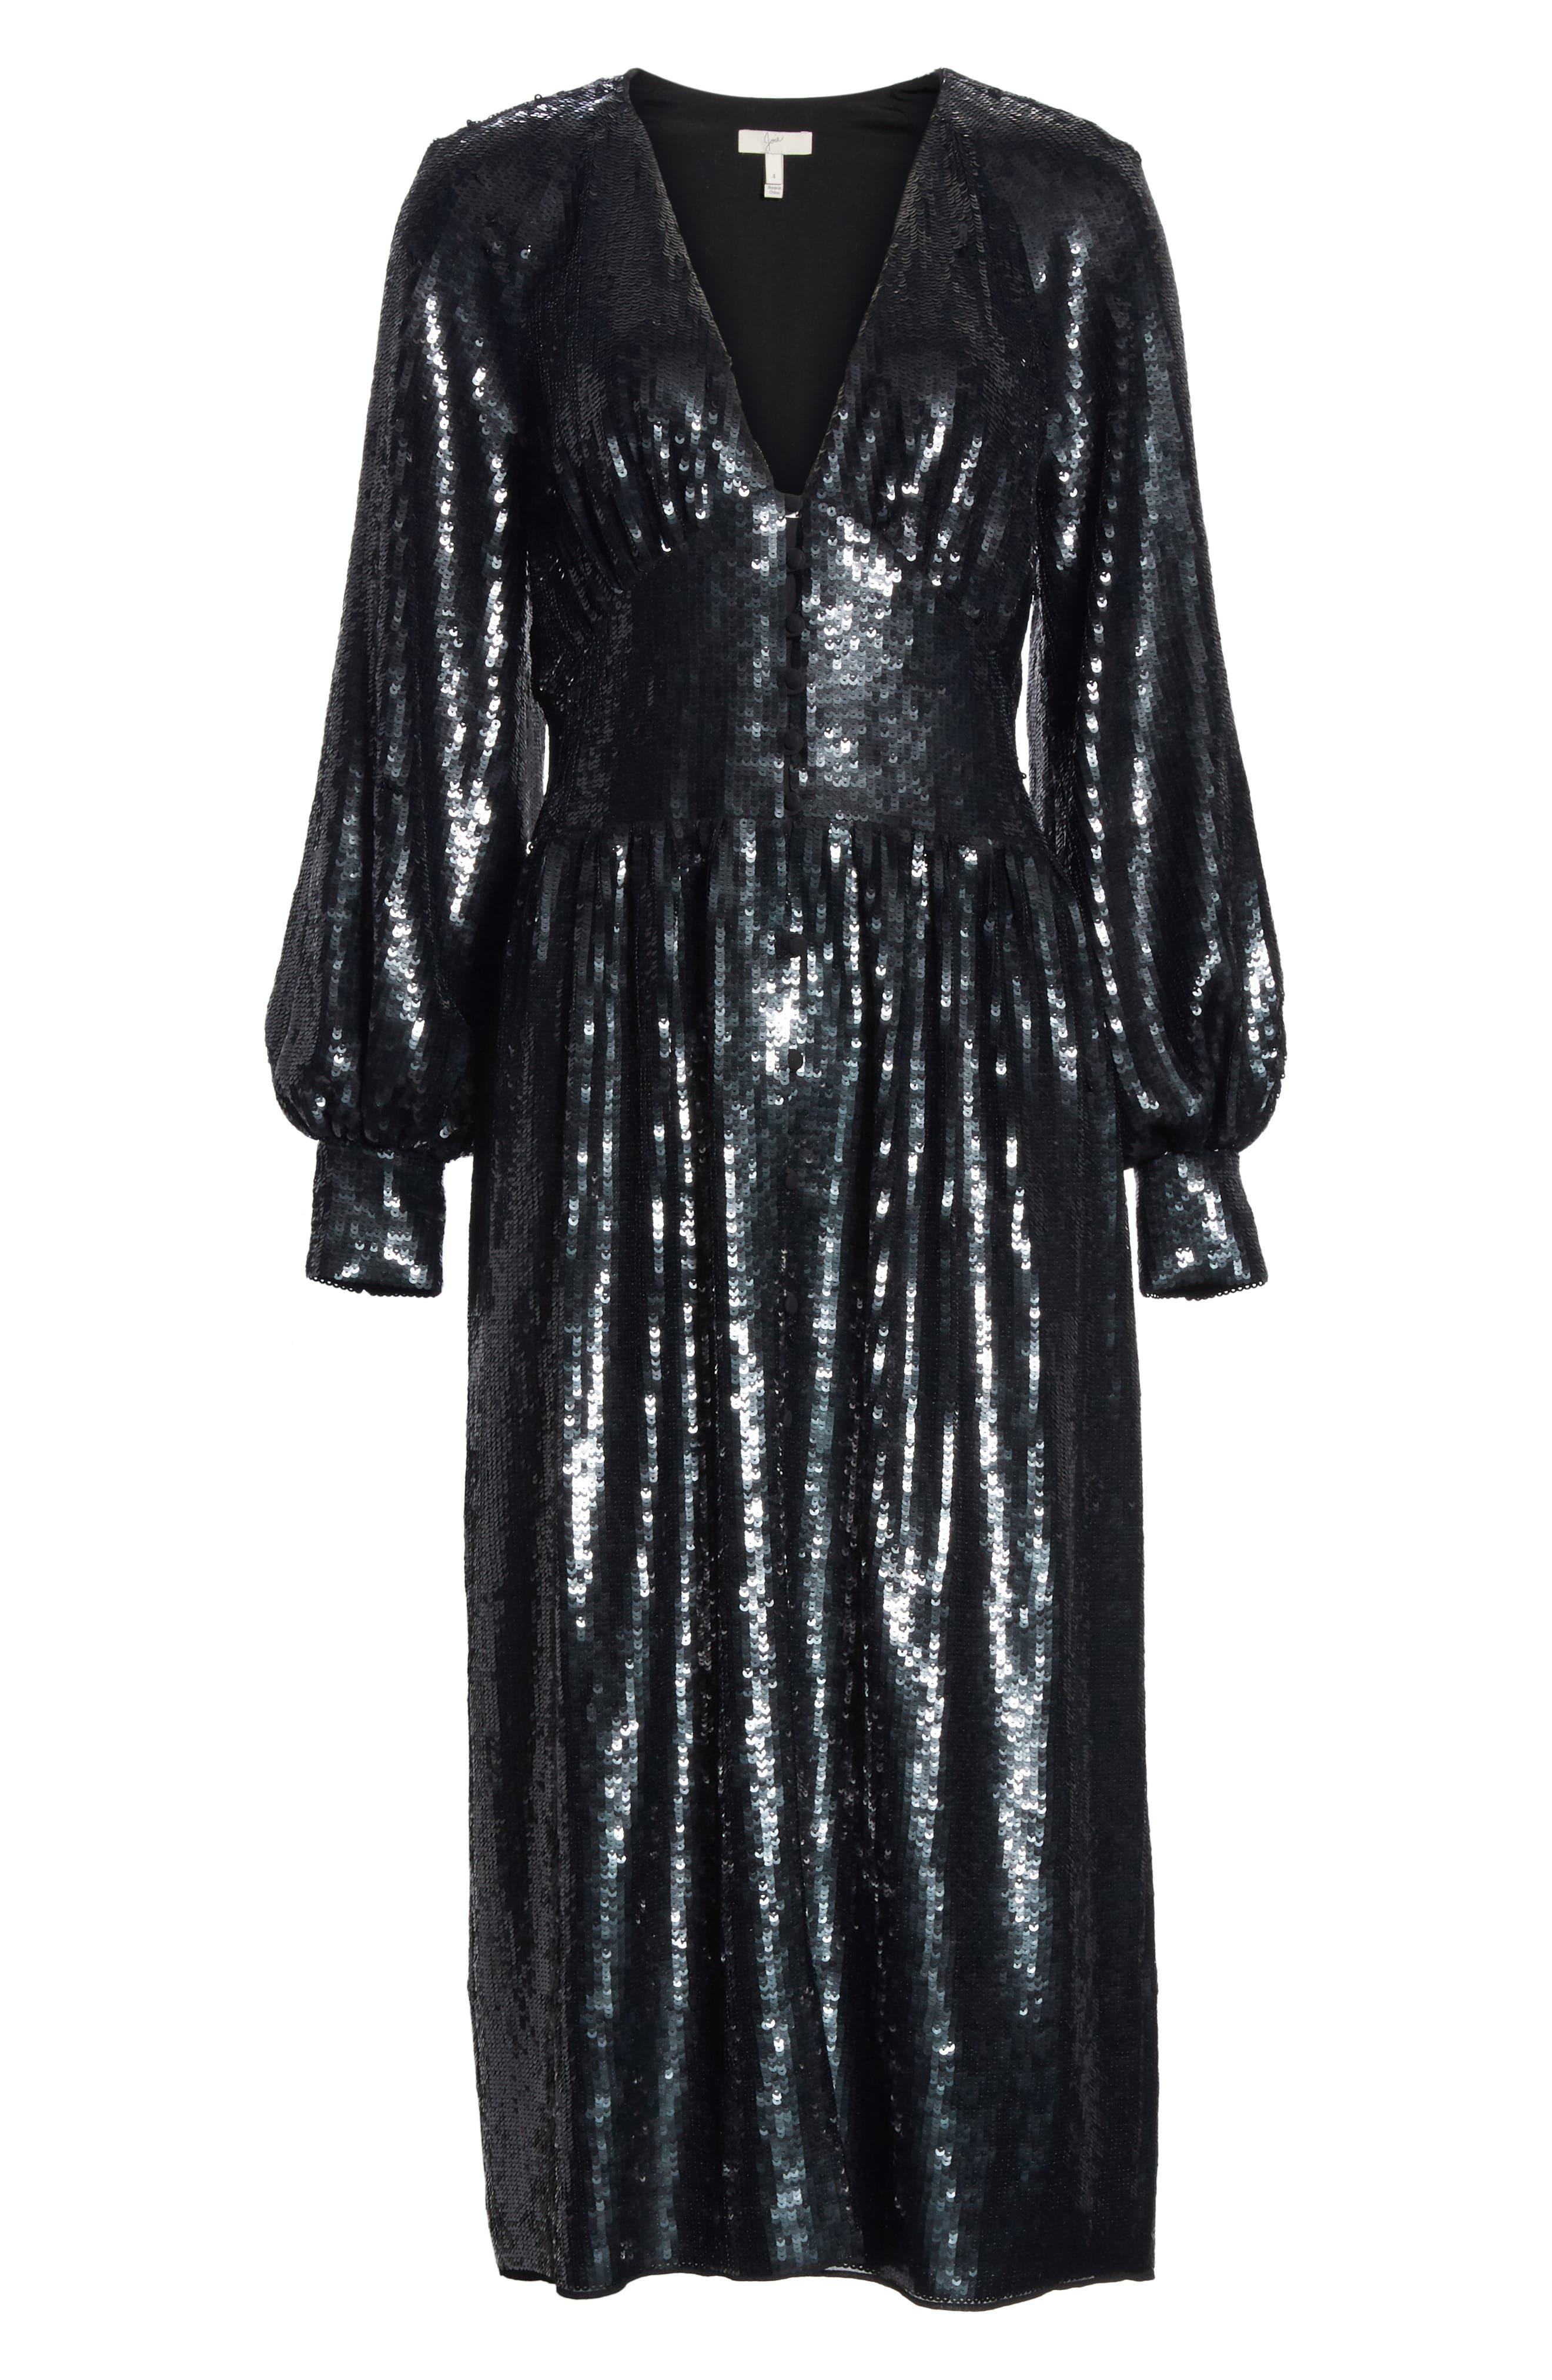 Kyria B Sequin Midi Dress,                             Alternate thumbnail 6, color,                             001